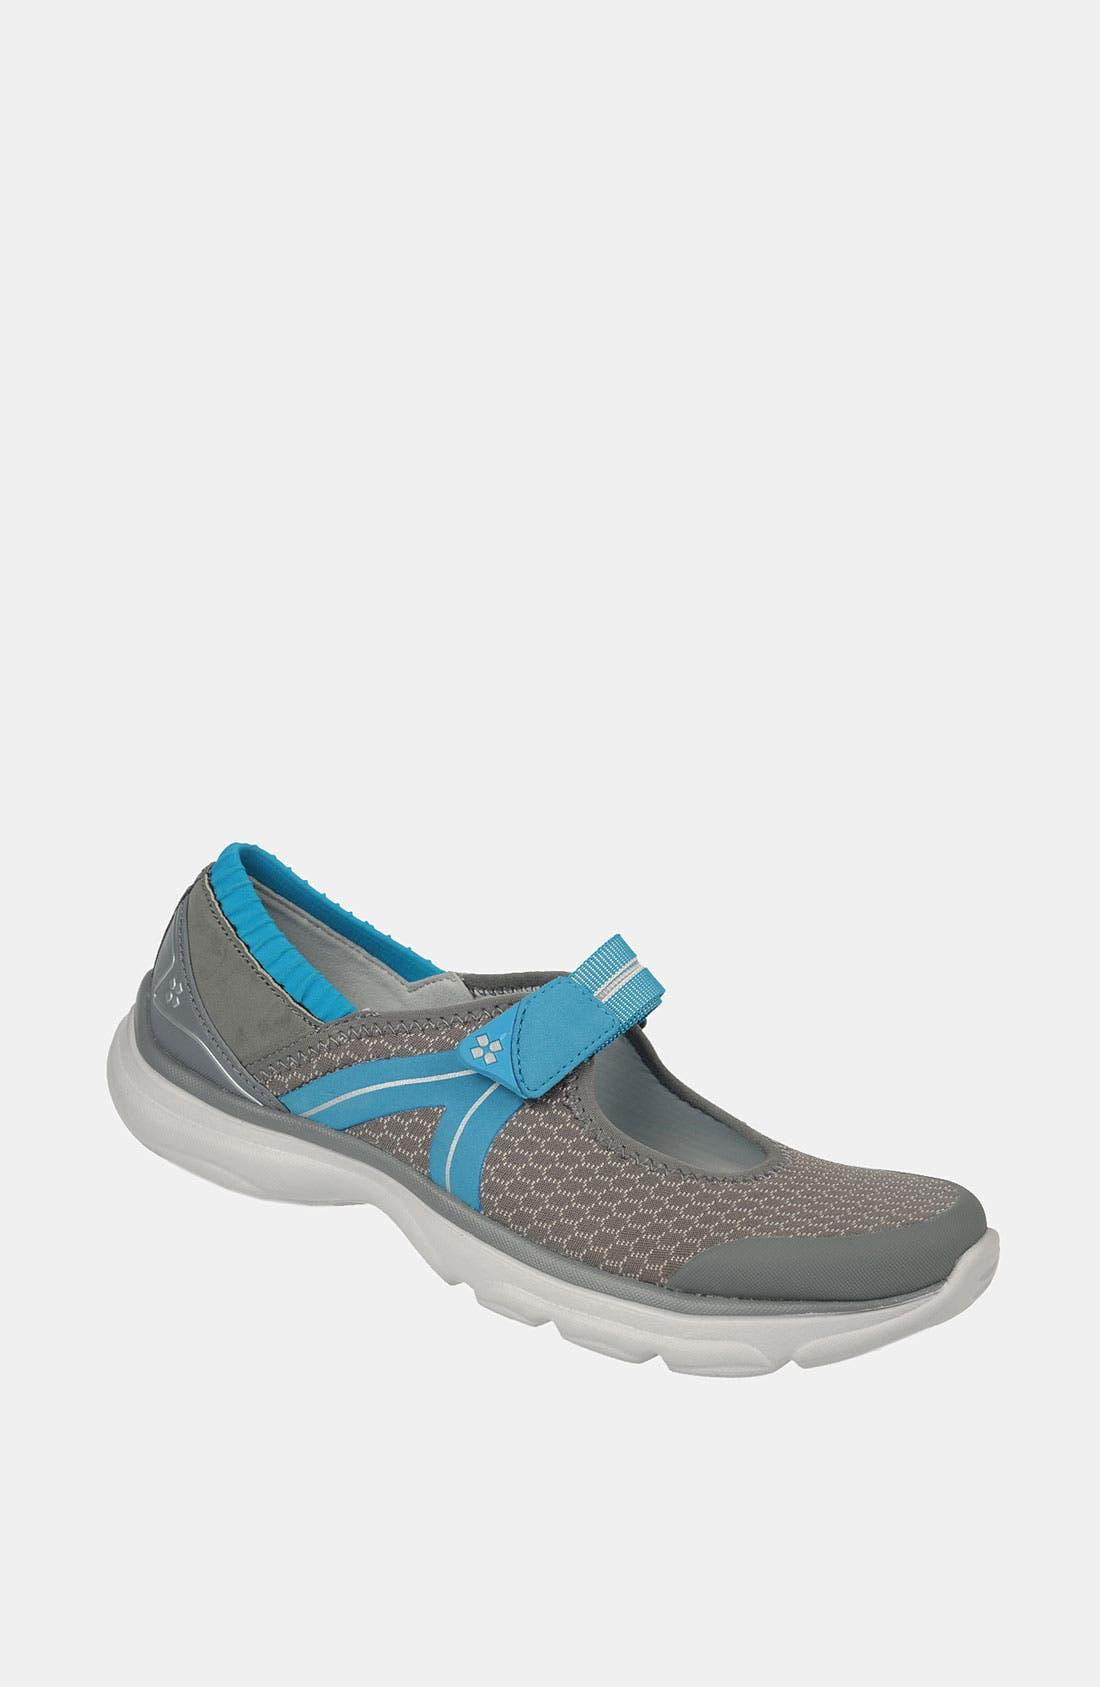 Alternate Image 1 Selected - Naturalizer 'BZees - Boardwalk' Walking Shoe